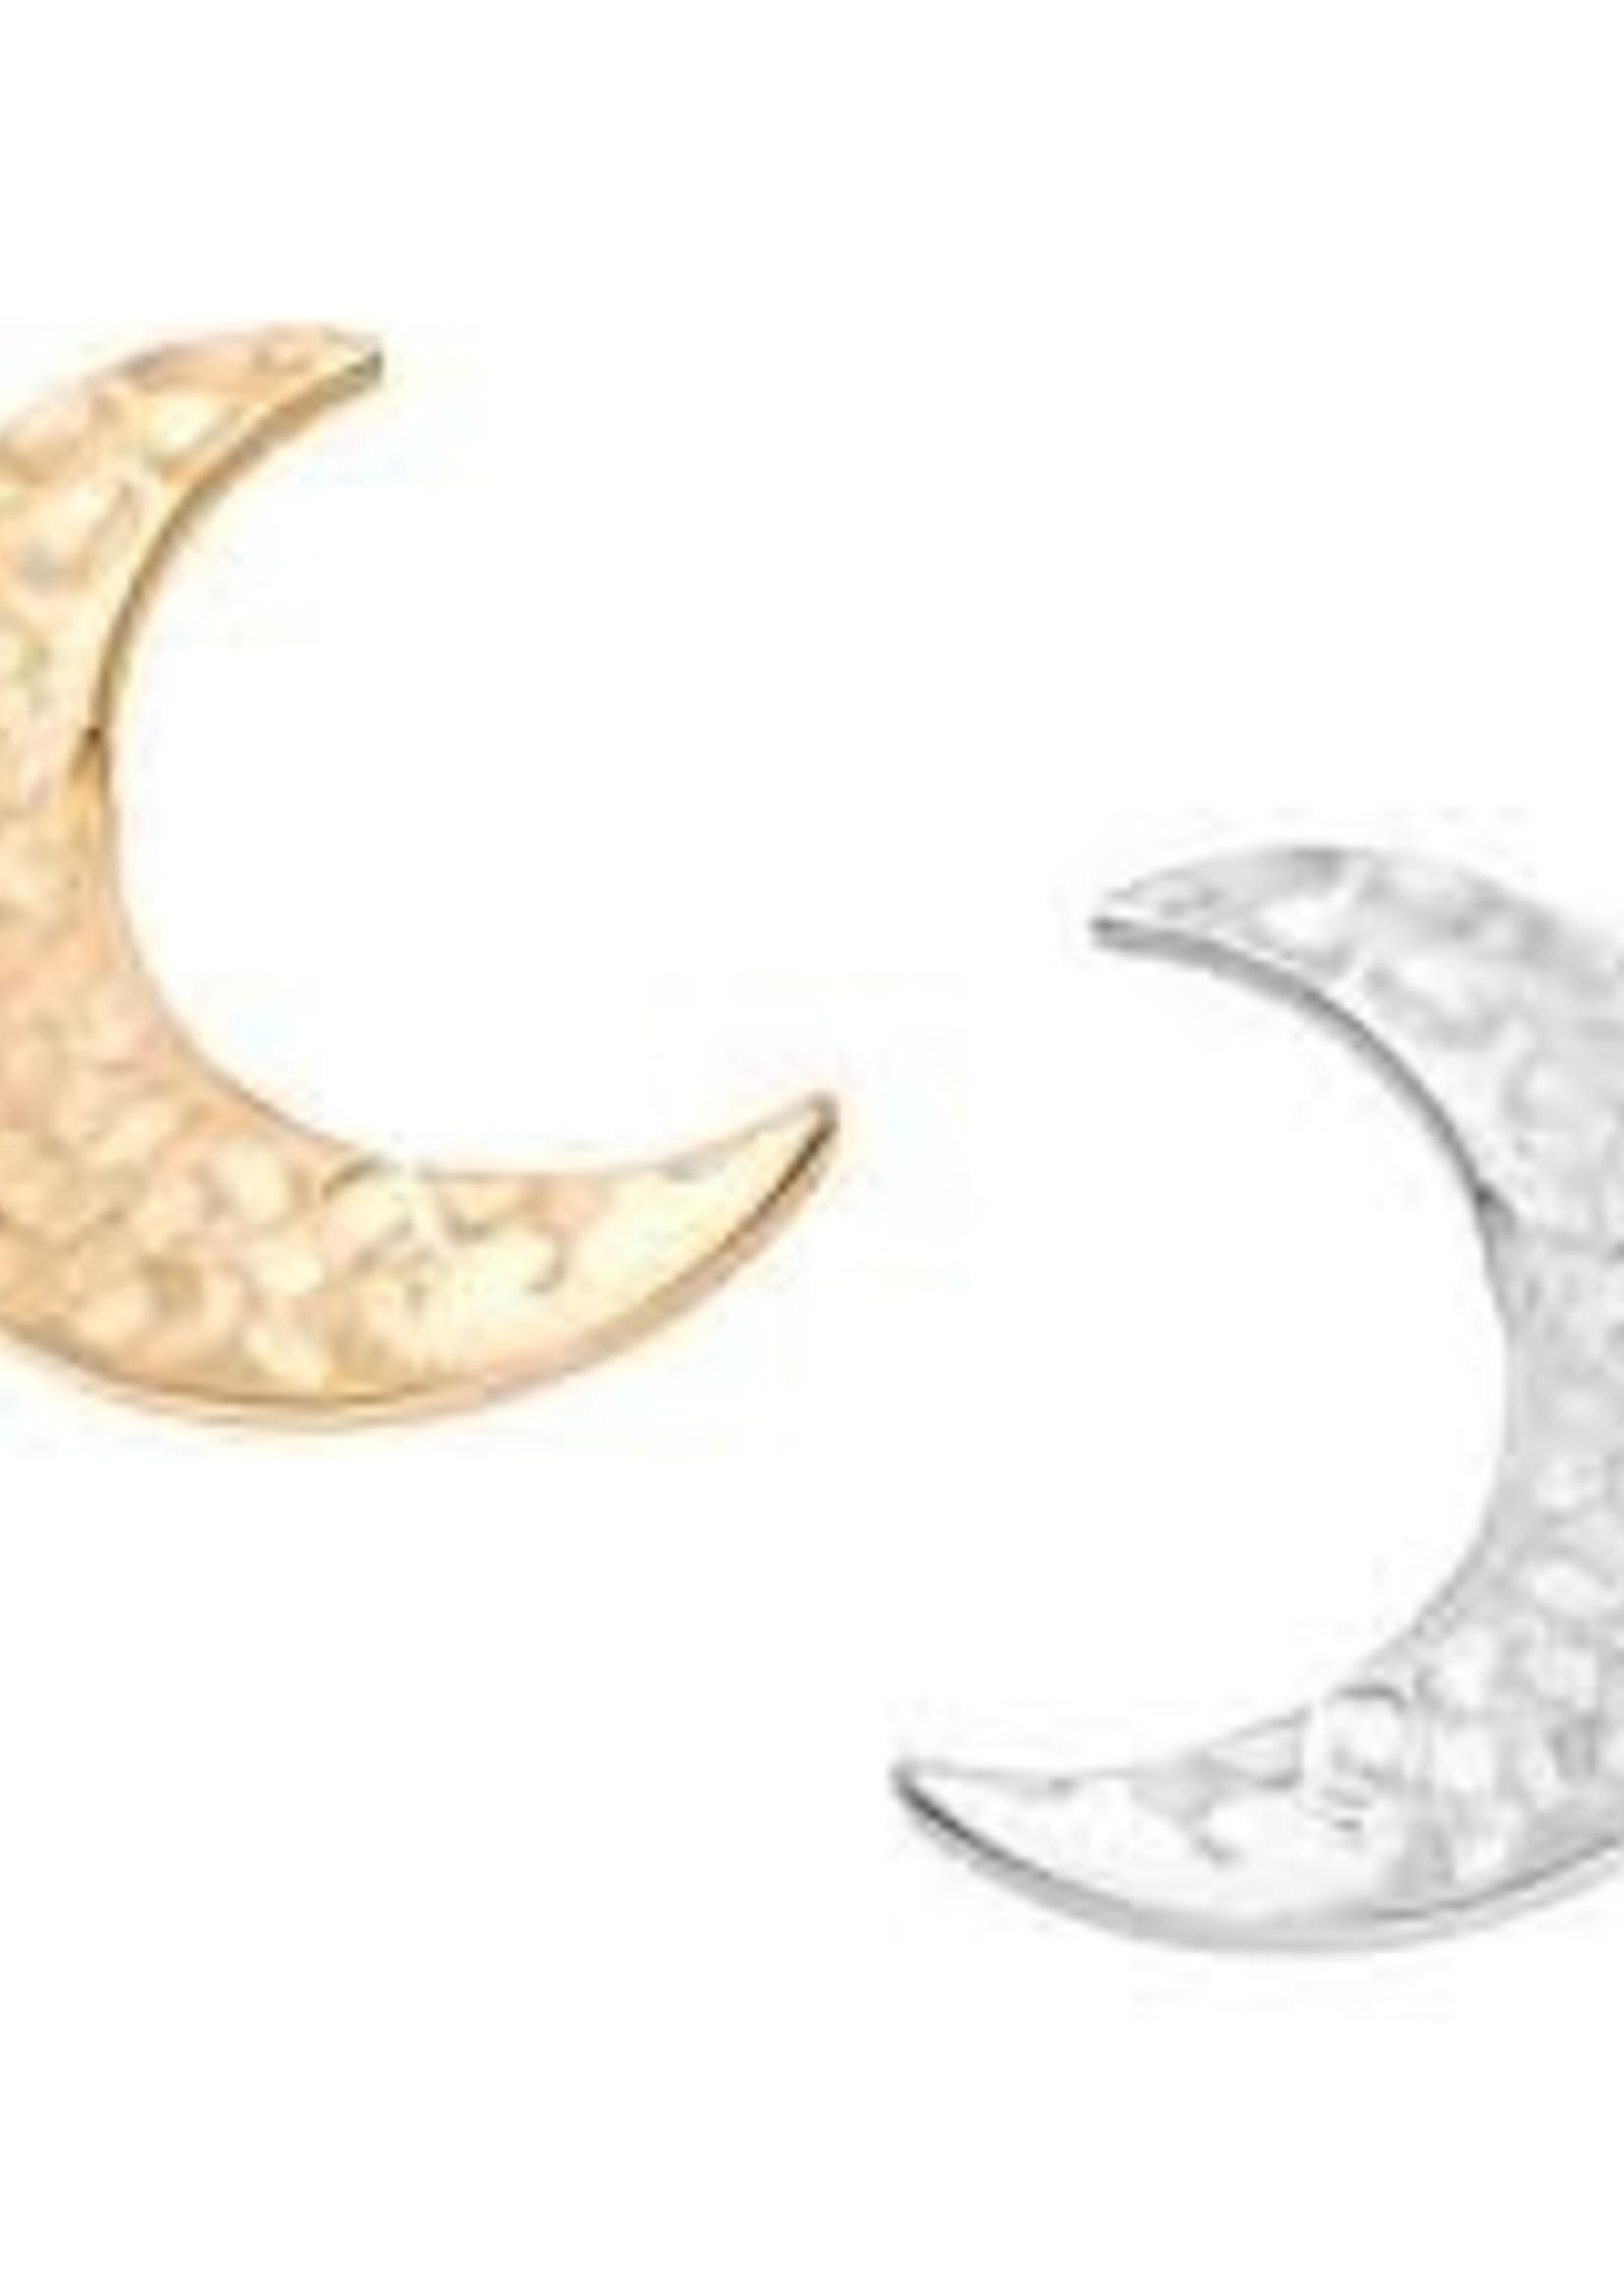 18k WG Hammered Crescent Moon (6.5mm)